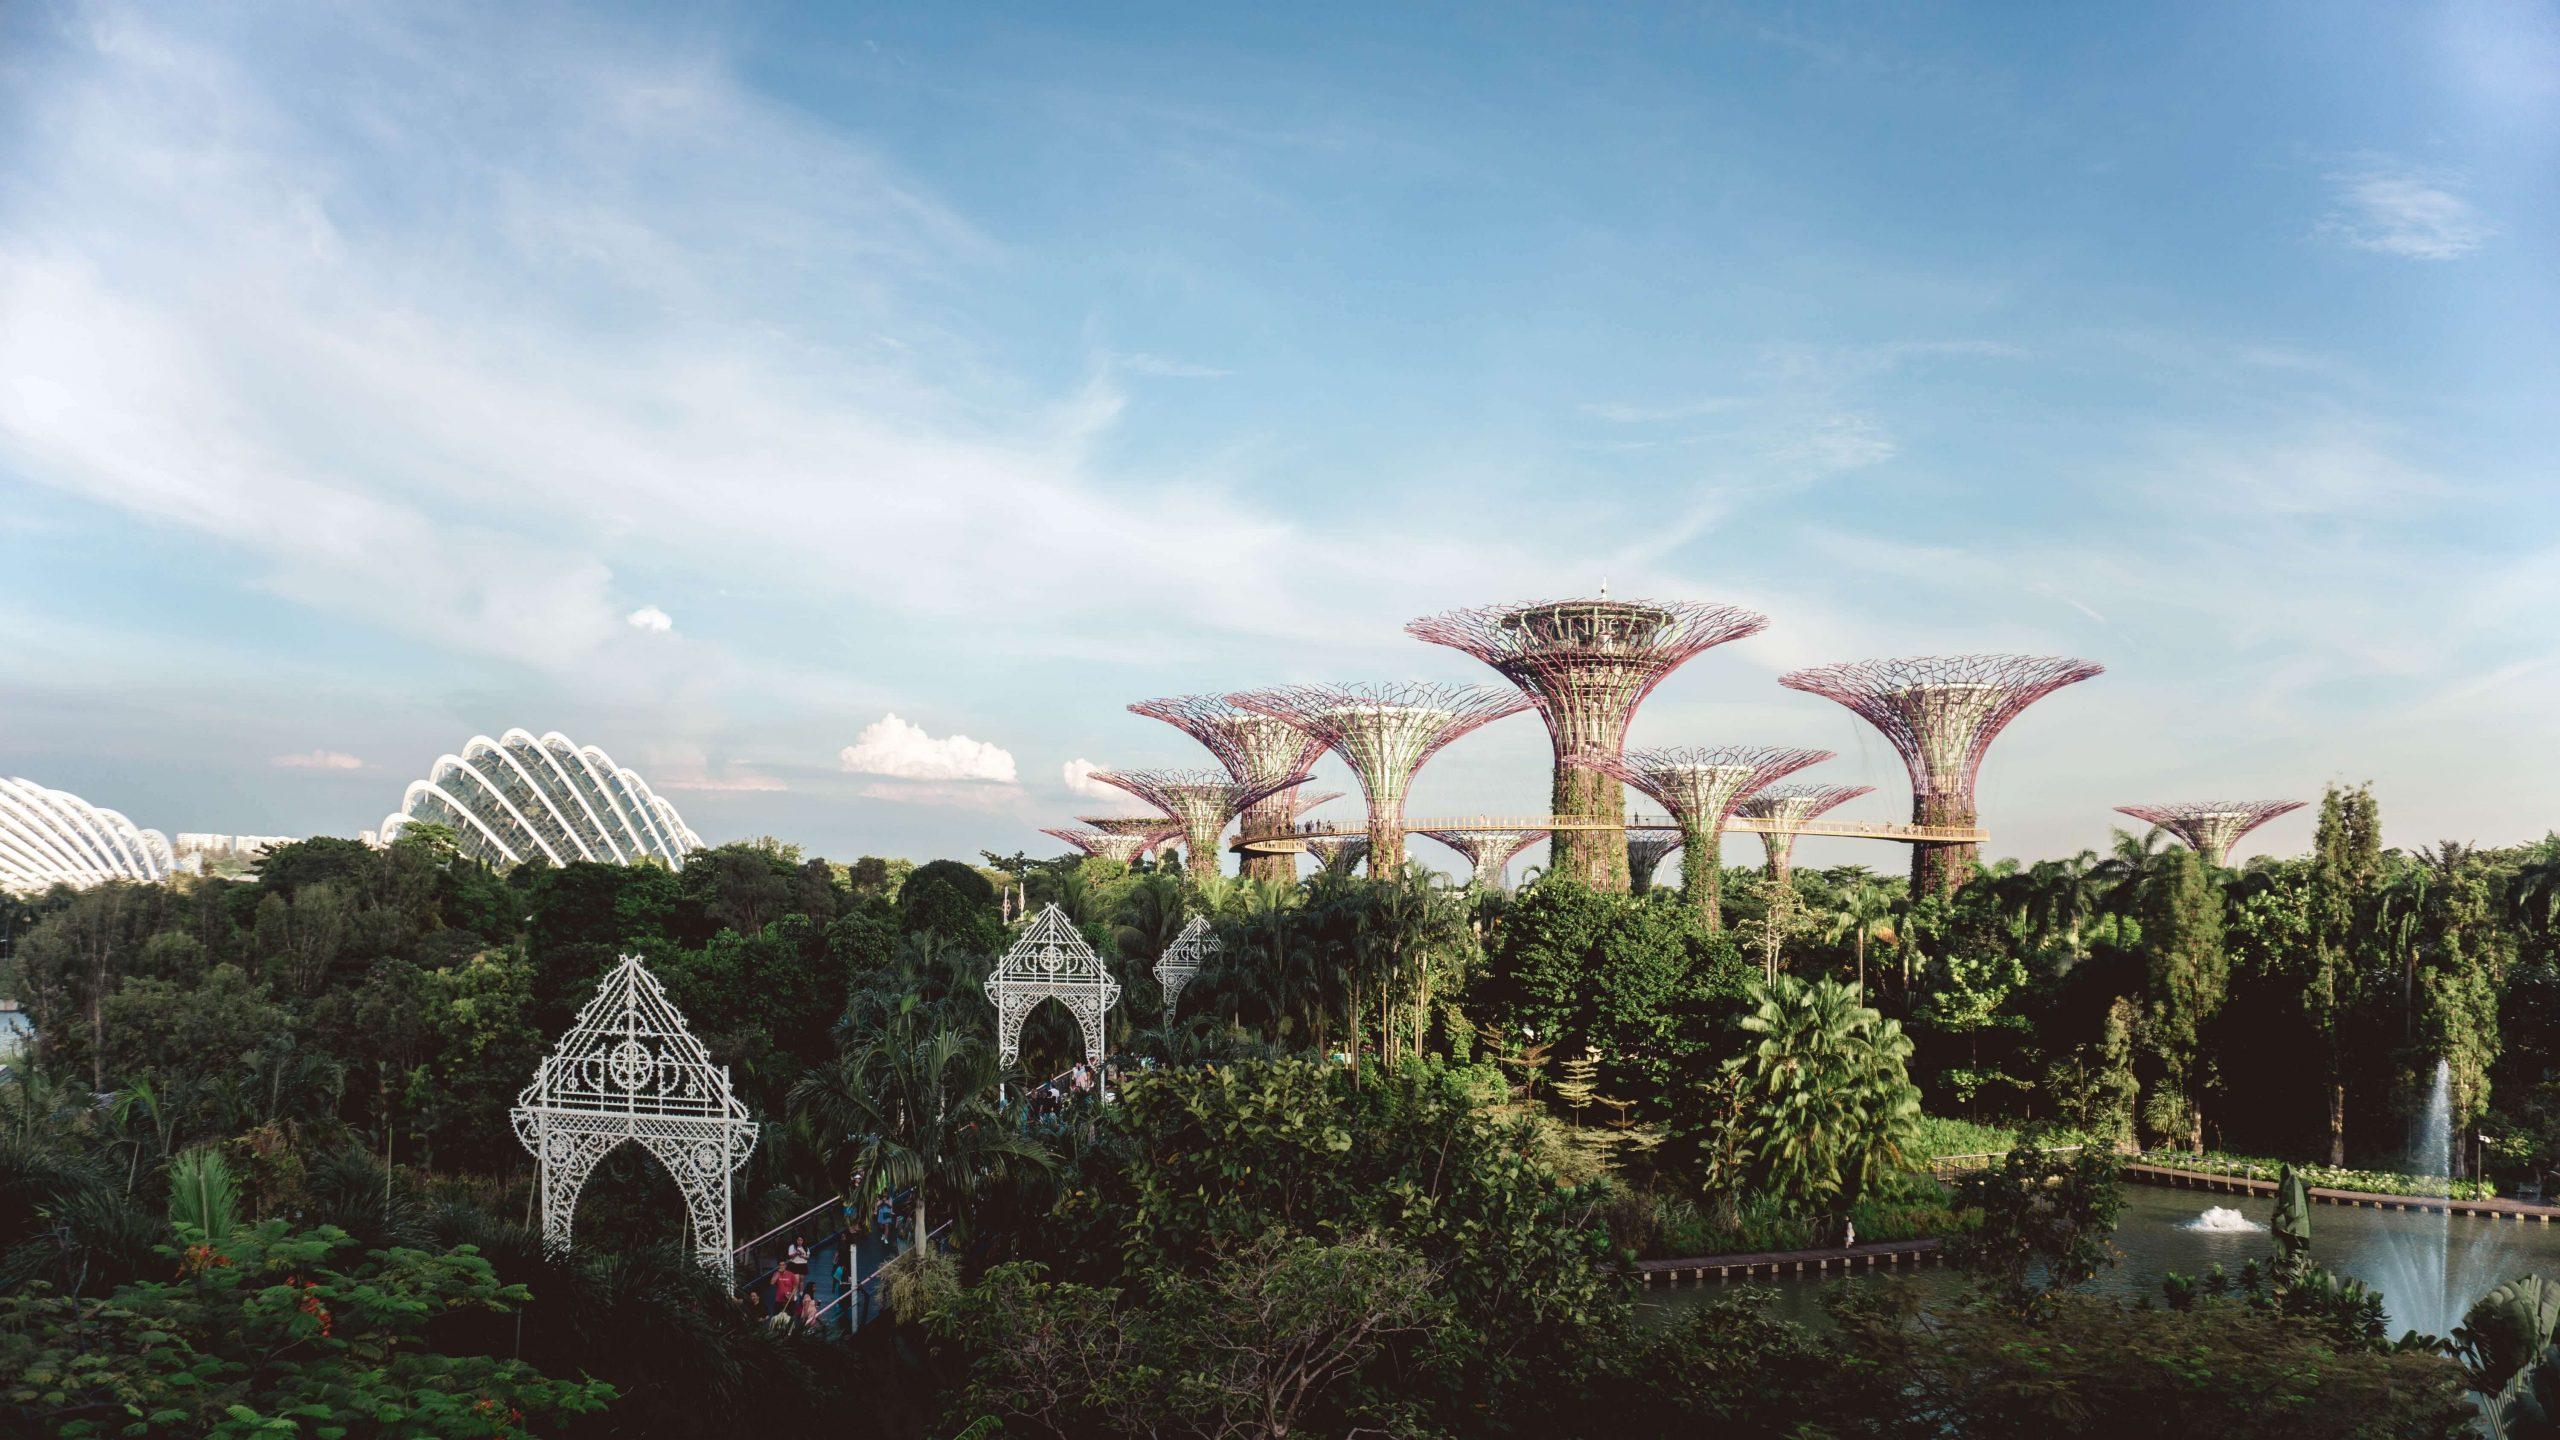 SIngapore expat stories